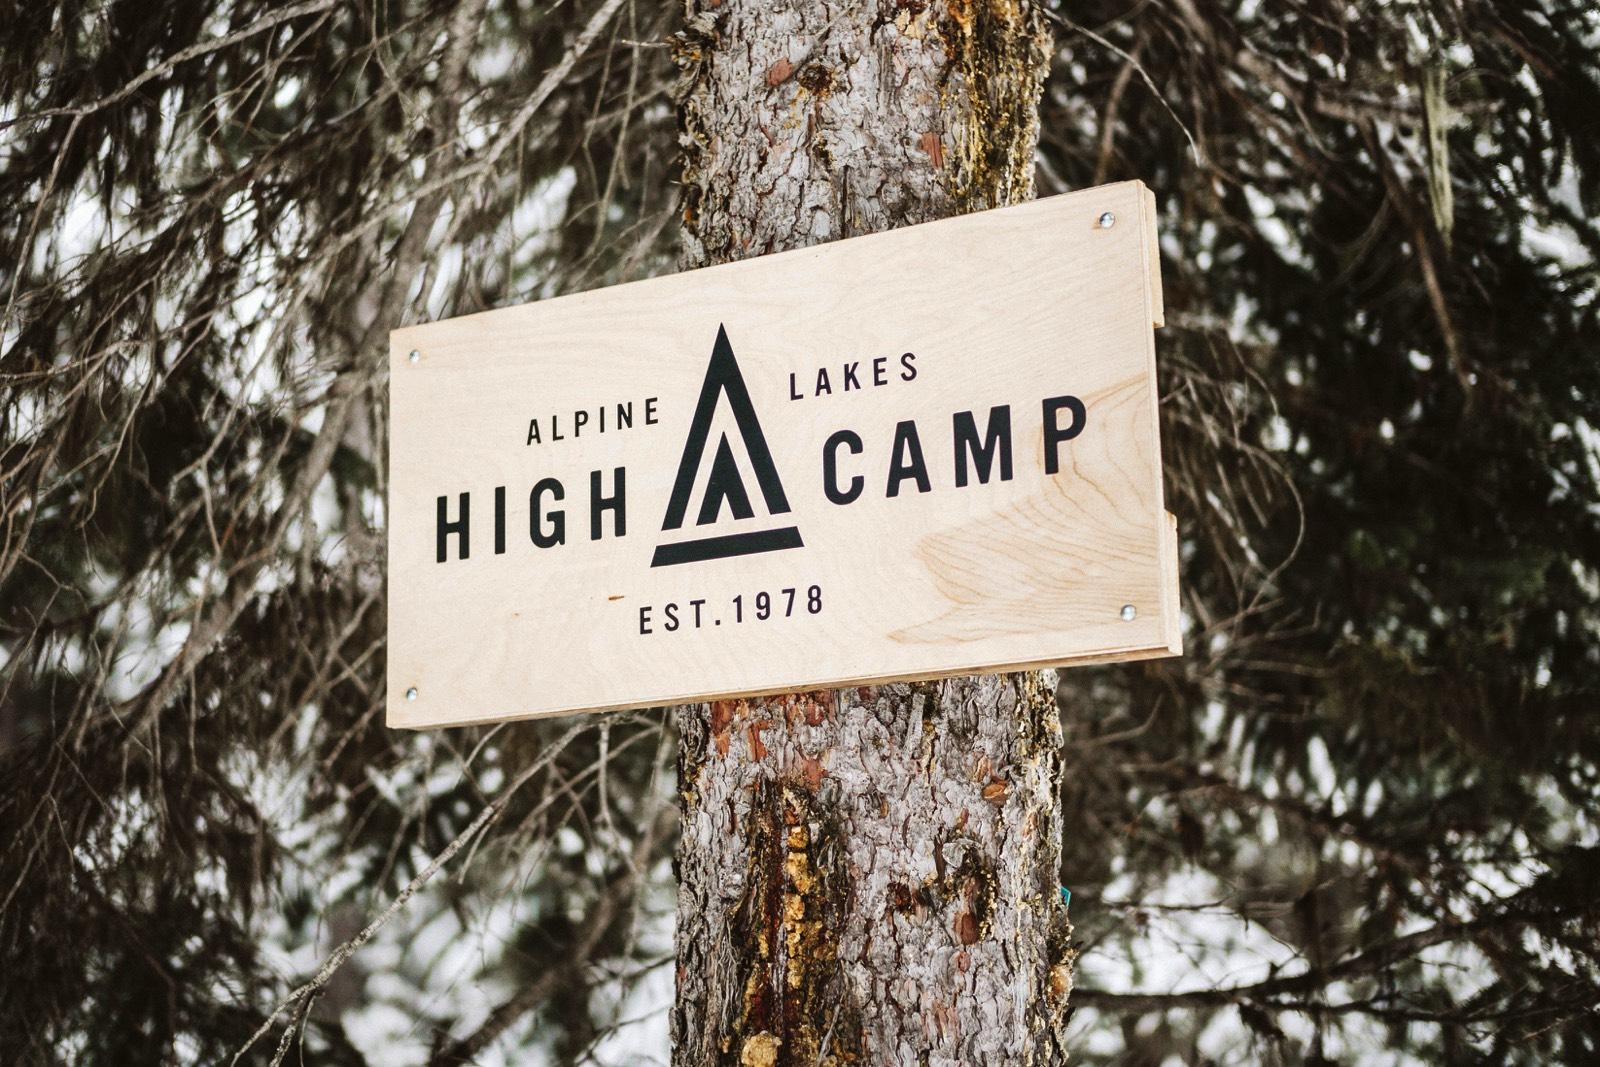 alpine-lakes-high-camp-winter-wedding-74 ALPINE LAKES HIGH CAMP WEDDING